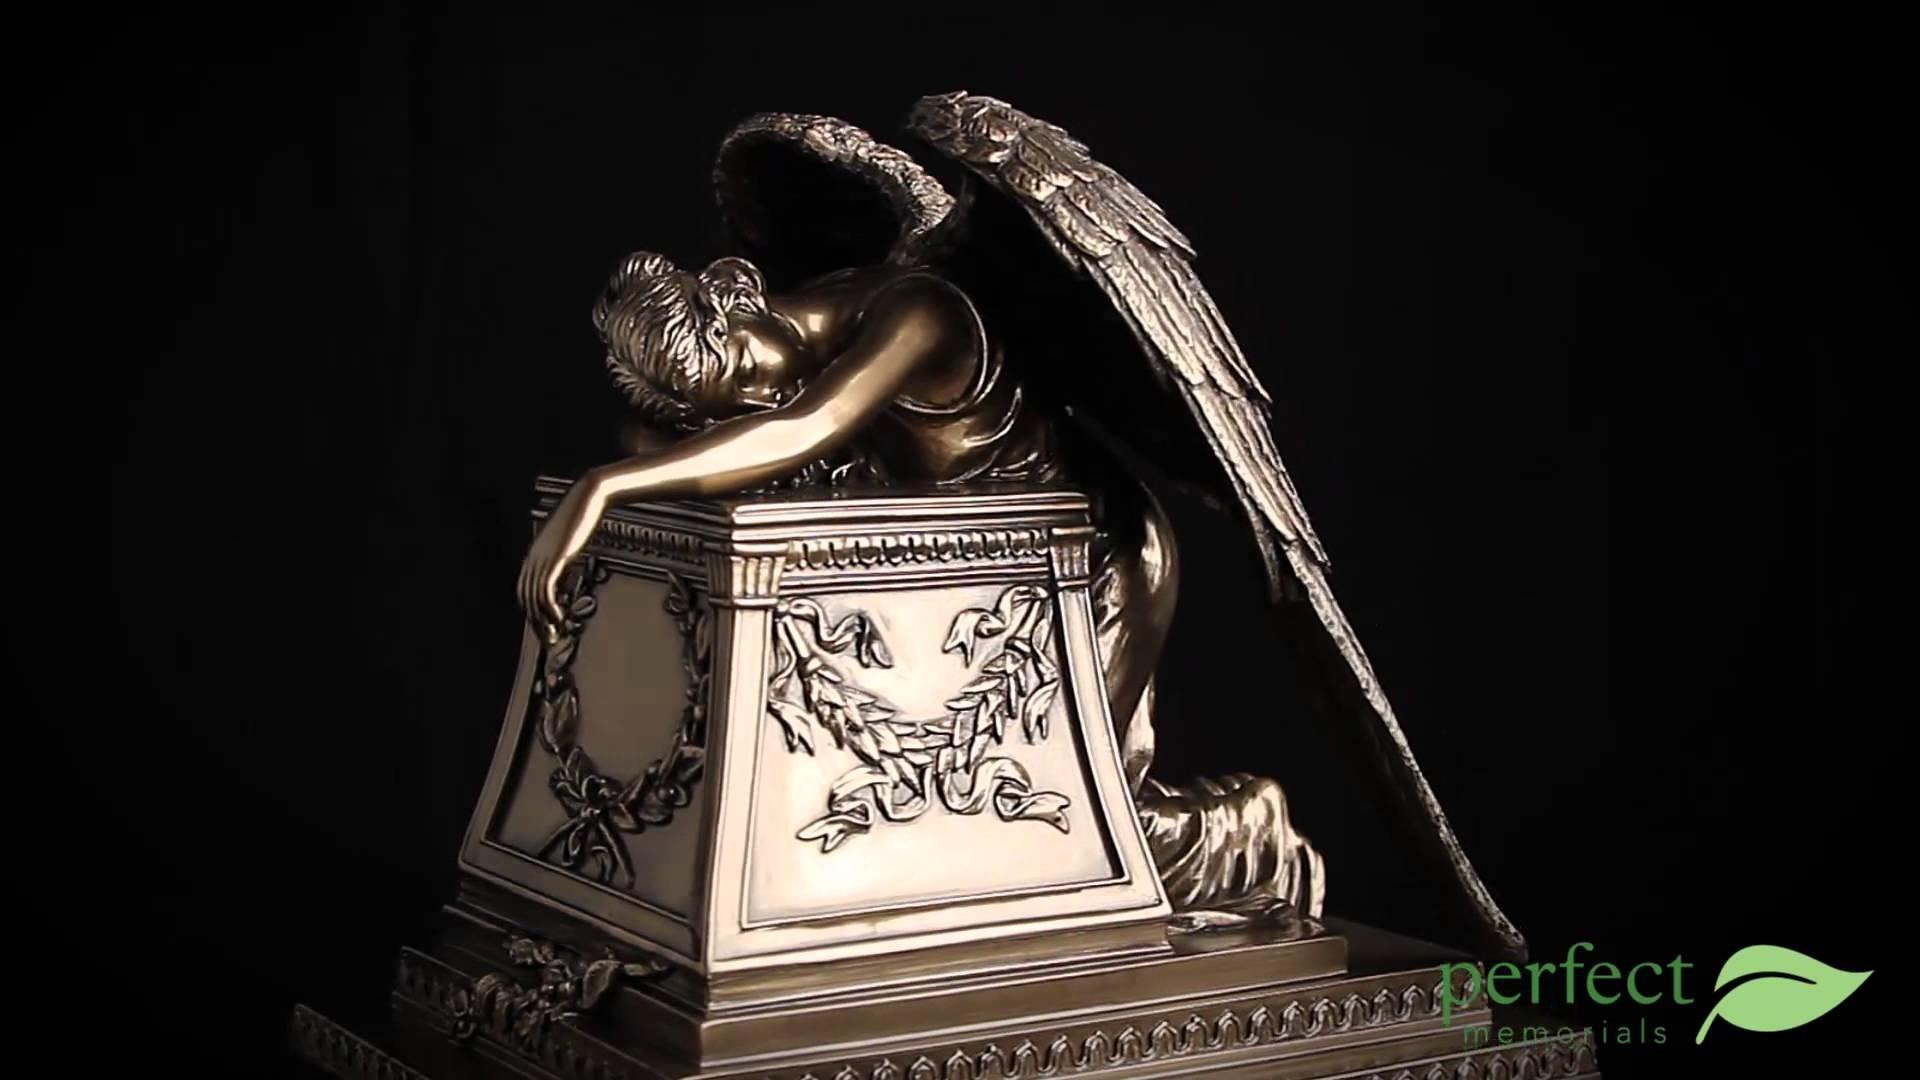 Medium Bronze Weeping Angel by Perfect Memorials